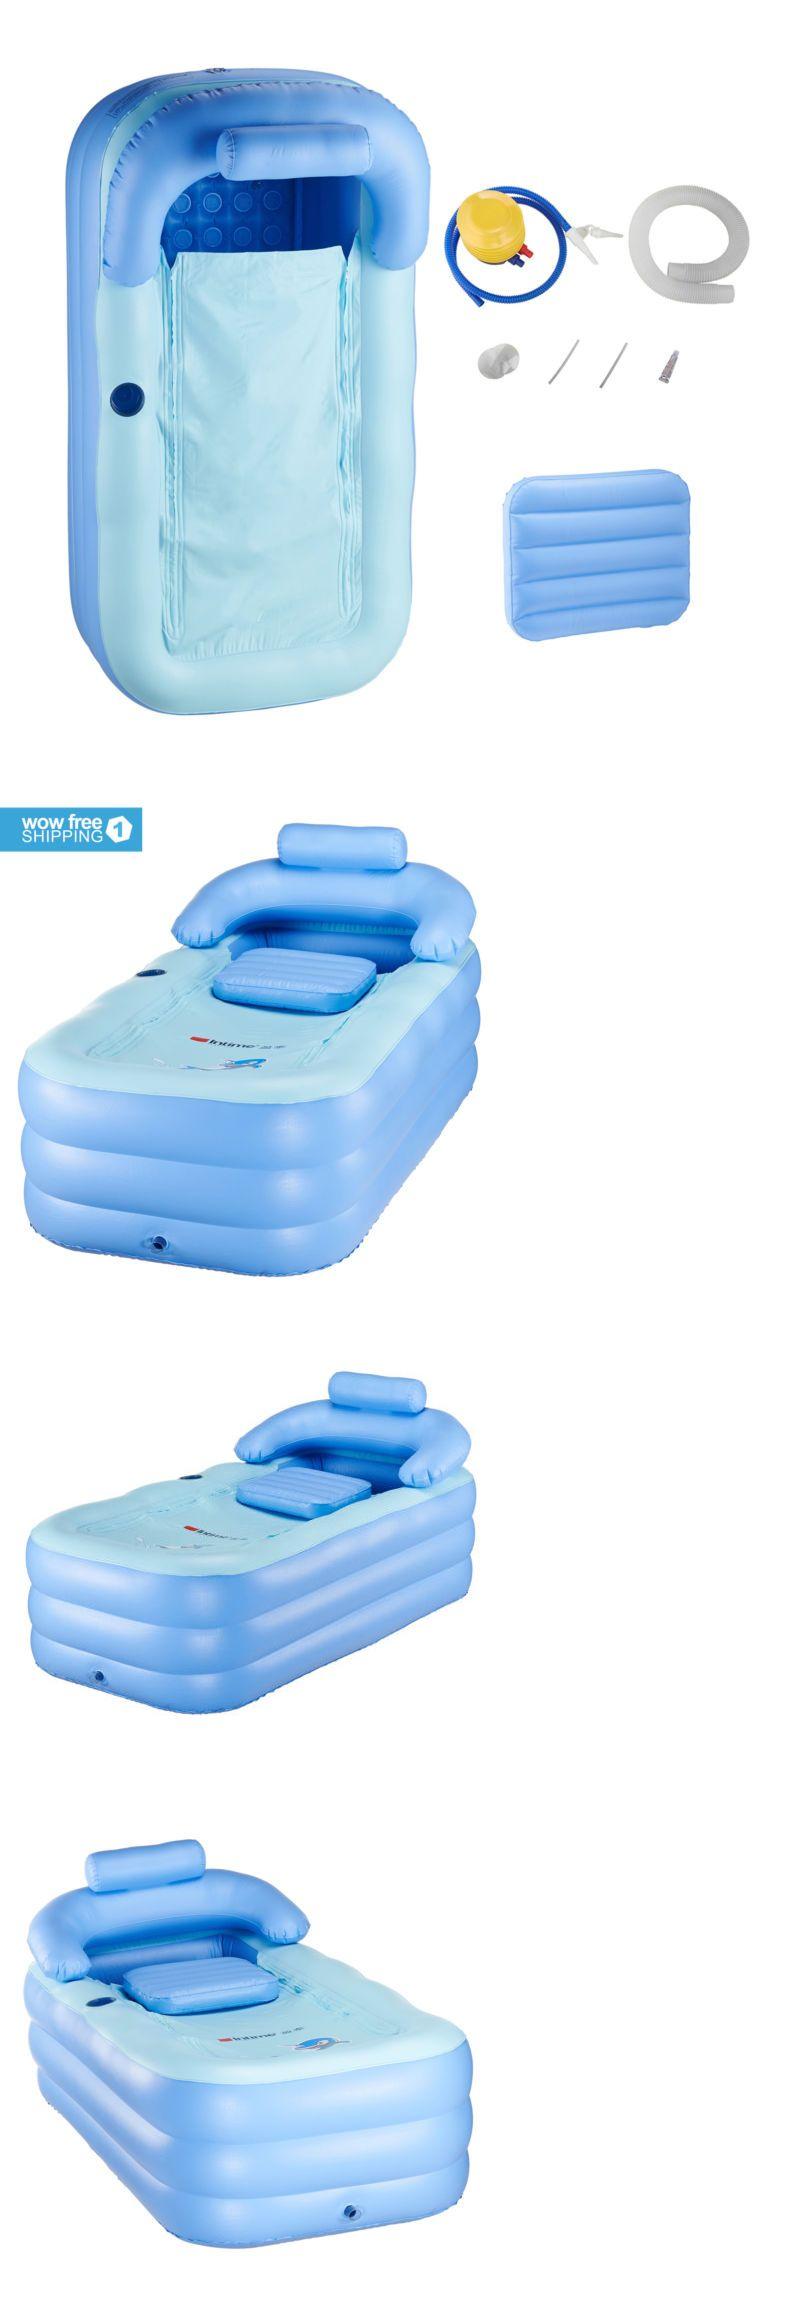 Bathtubs 42025: Blowup Adult Spa Pvc Folding Portable Bathtub Warm ...